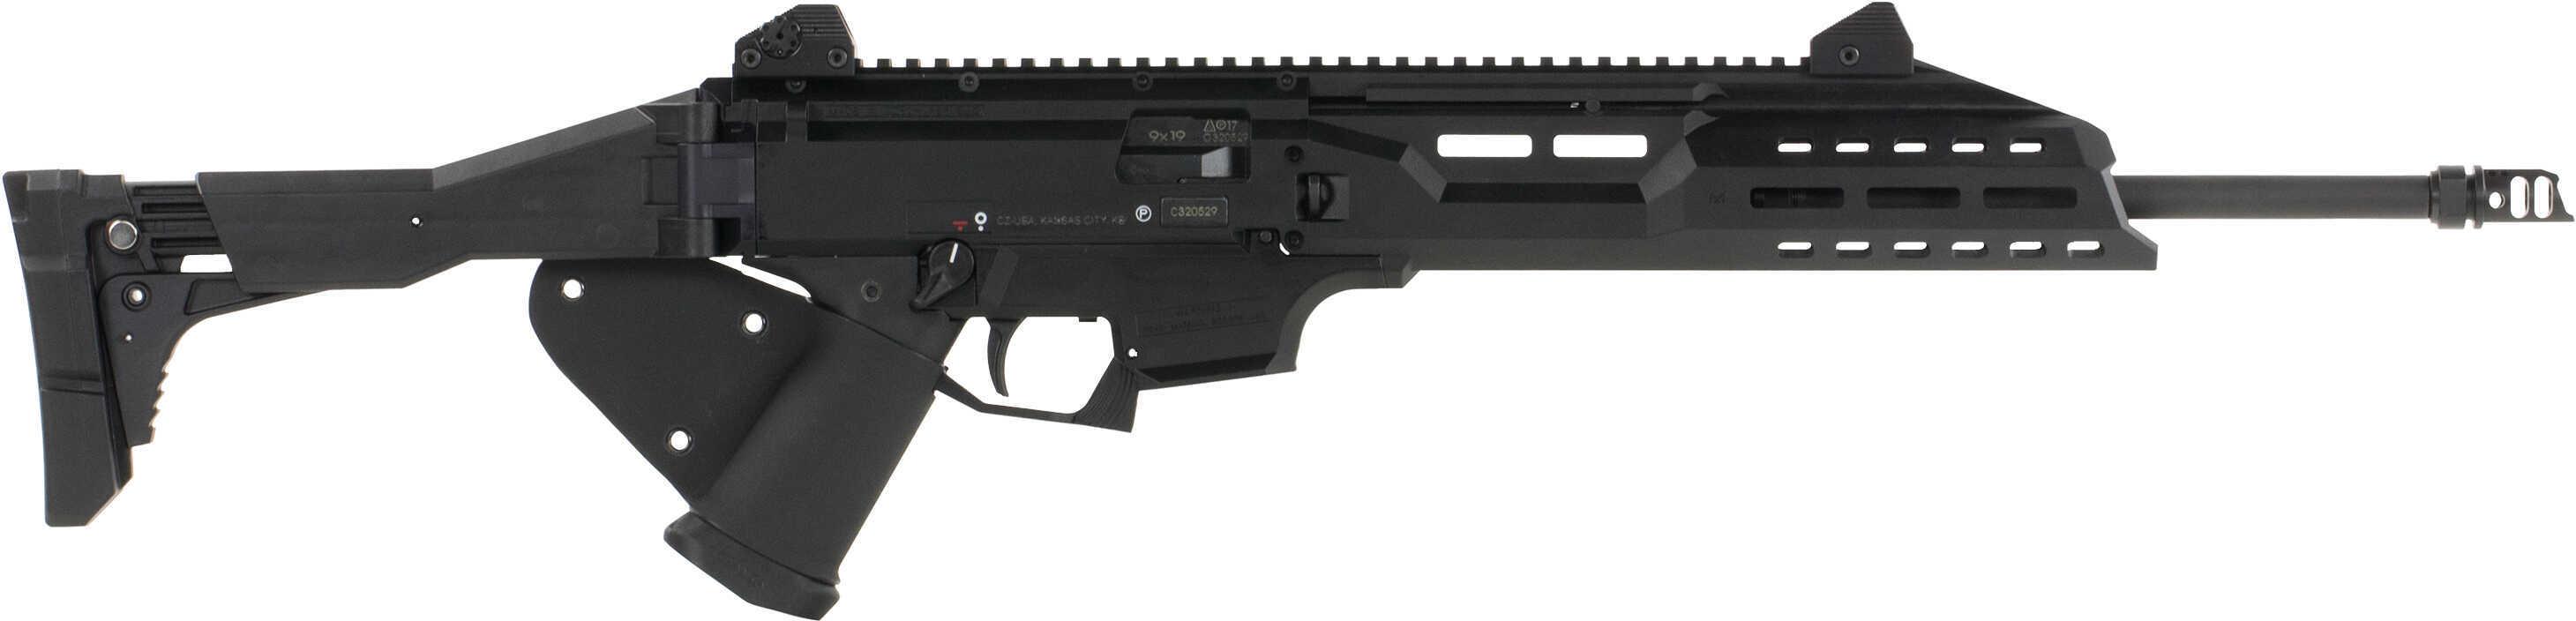 "Cz Scorpion Evo Rifle 9mm 16"" Barrel 10 Round Ca Compliant"